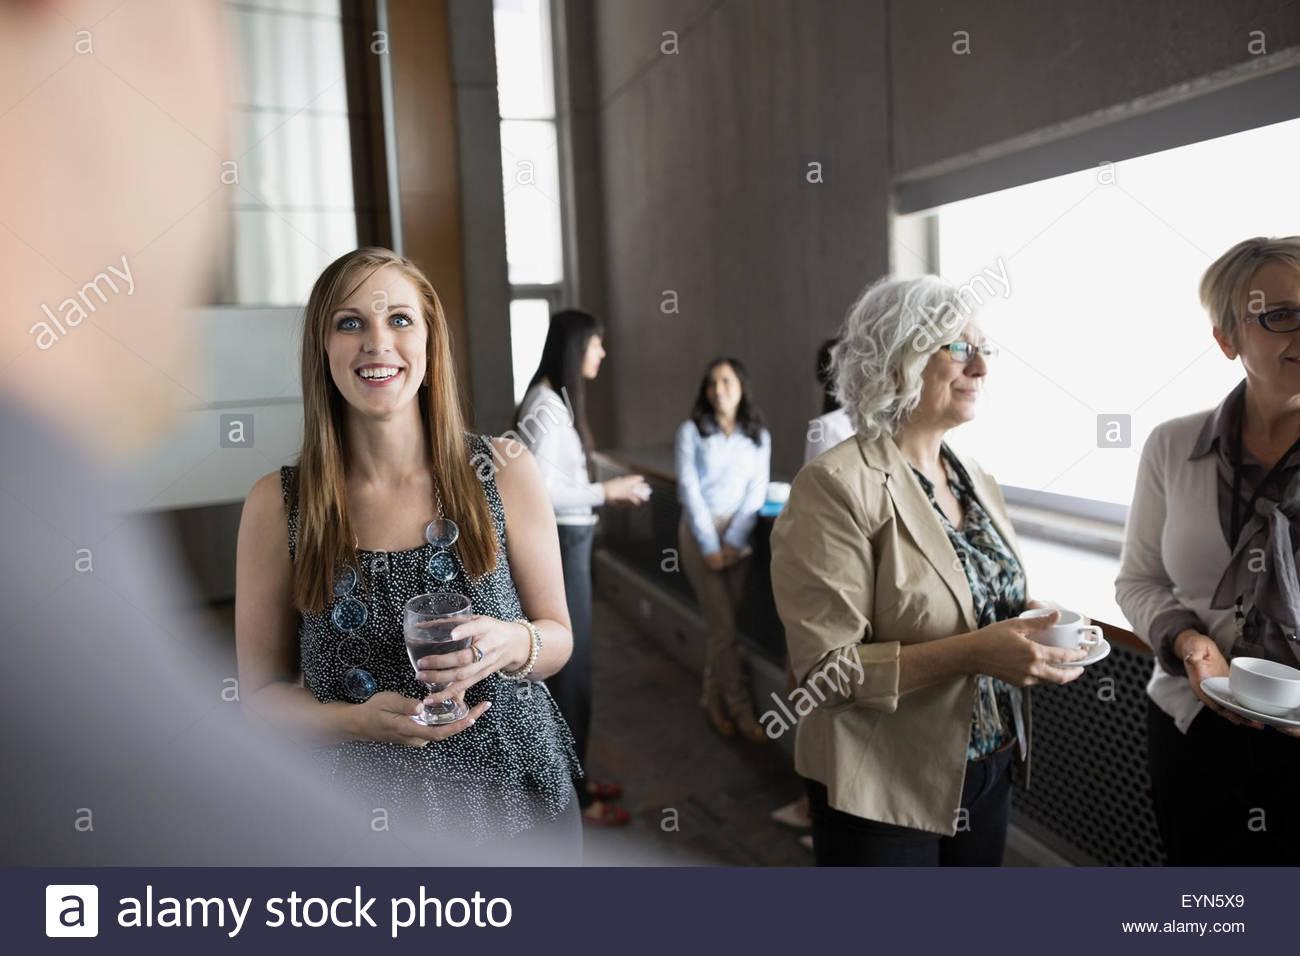 People socializing in auditorium - Stock Image